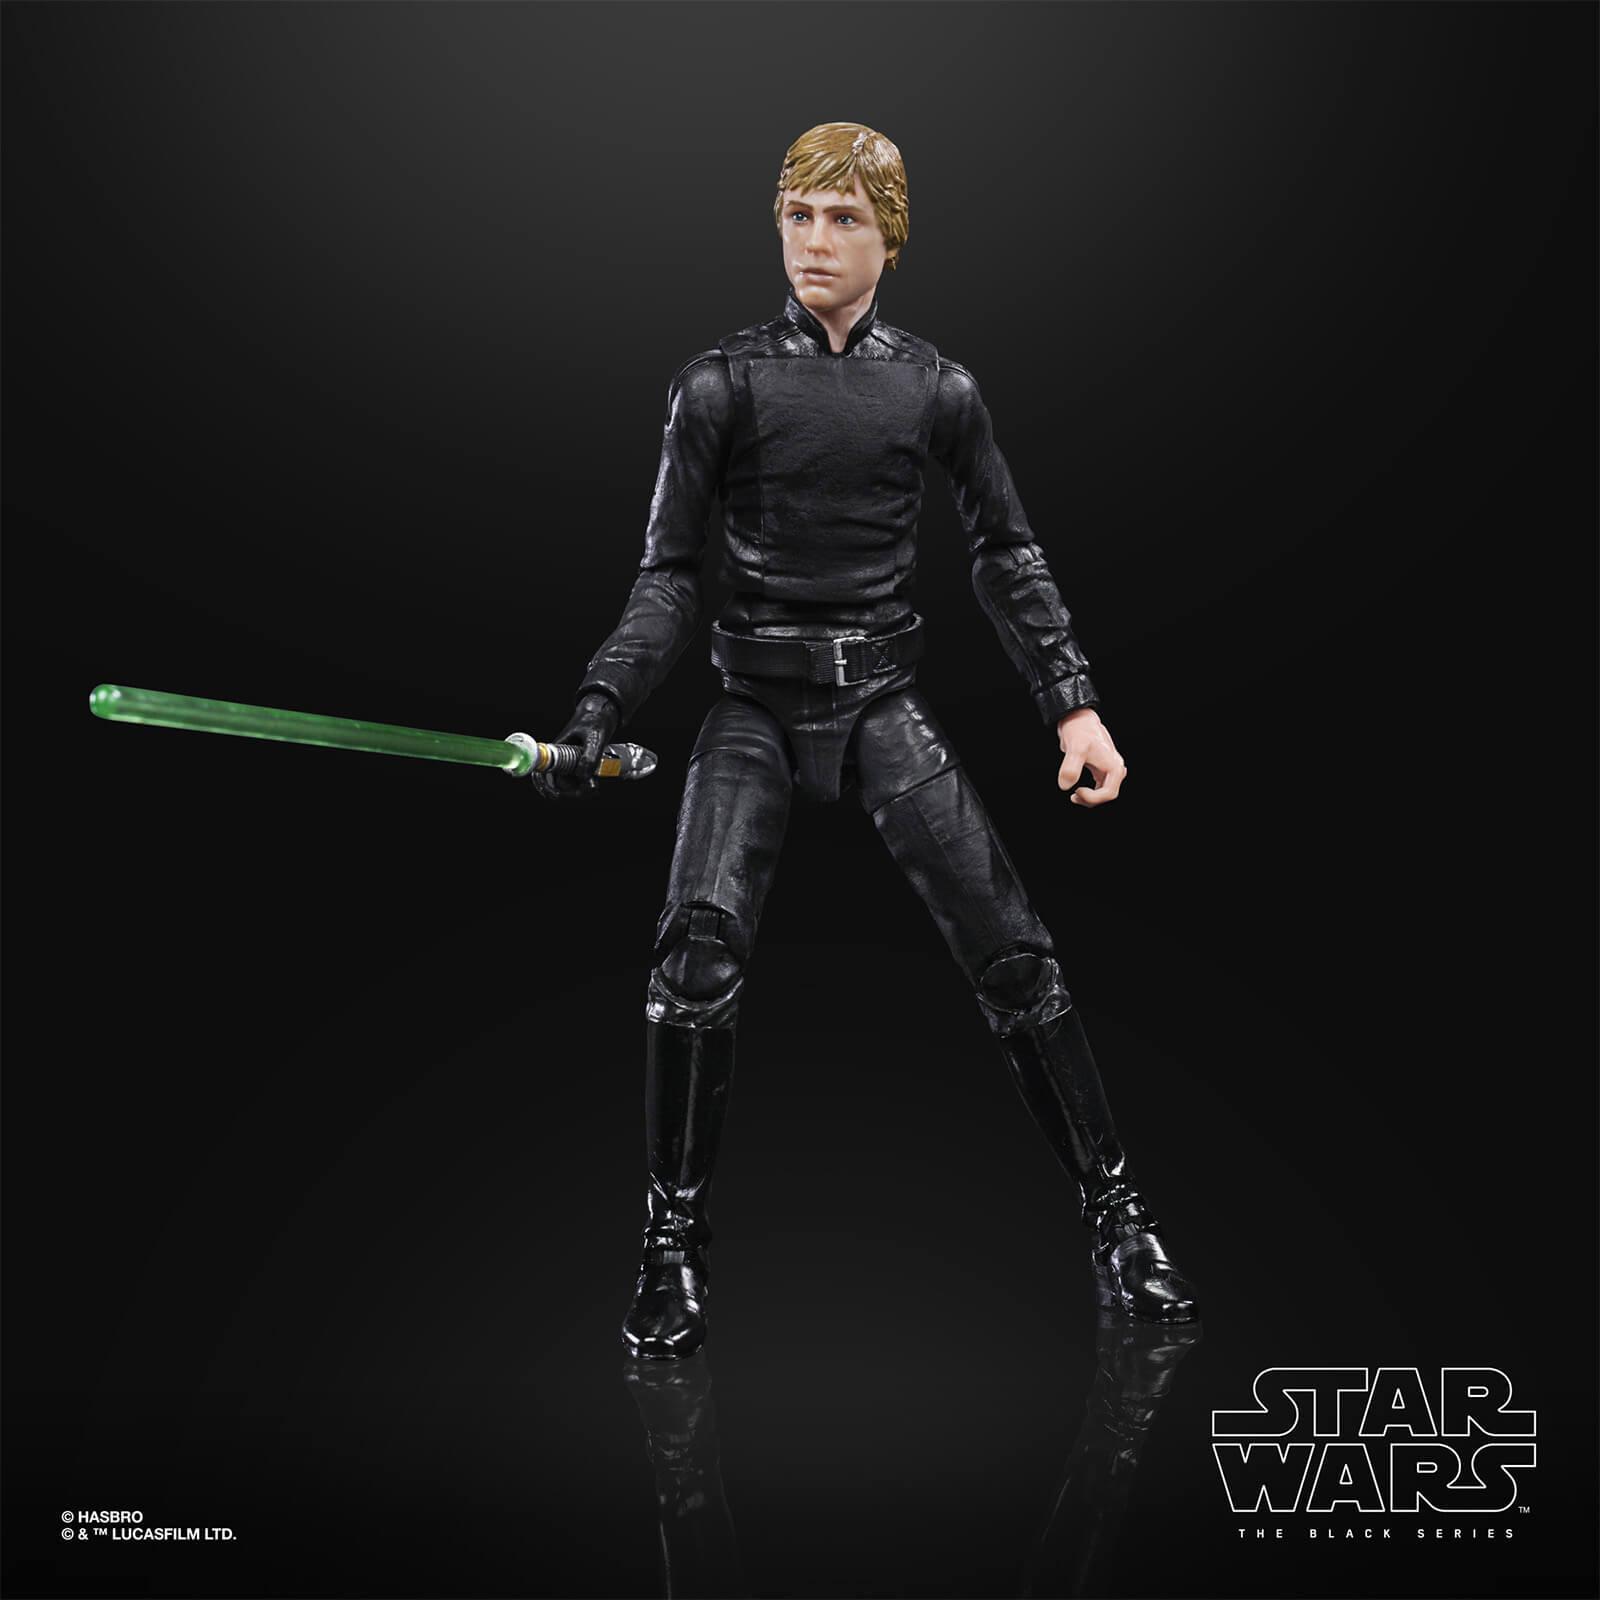 Star wars the black series luke skywalker endor 15cm5